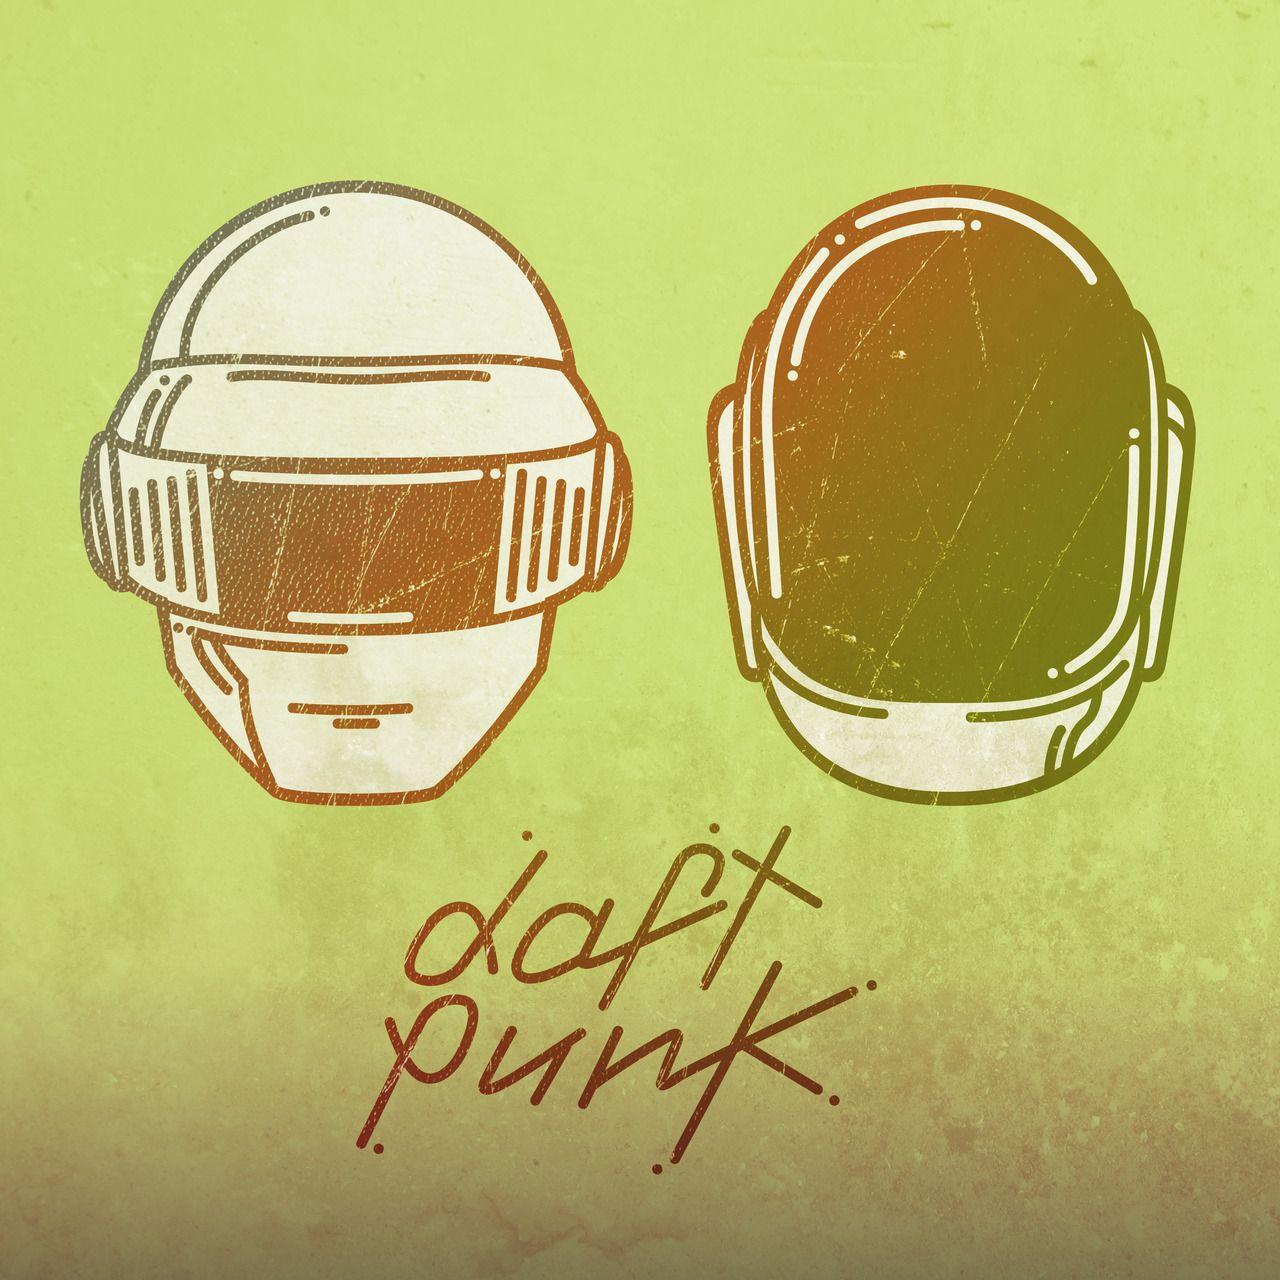 Simple line illustration of daft punk. | Delicious Illustrations ...